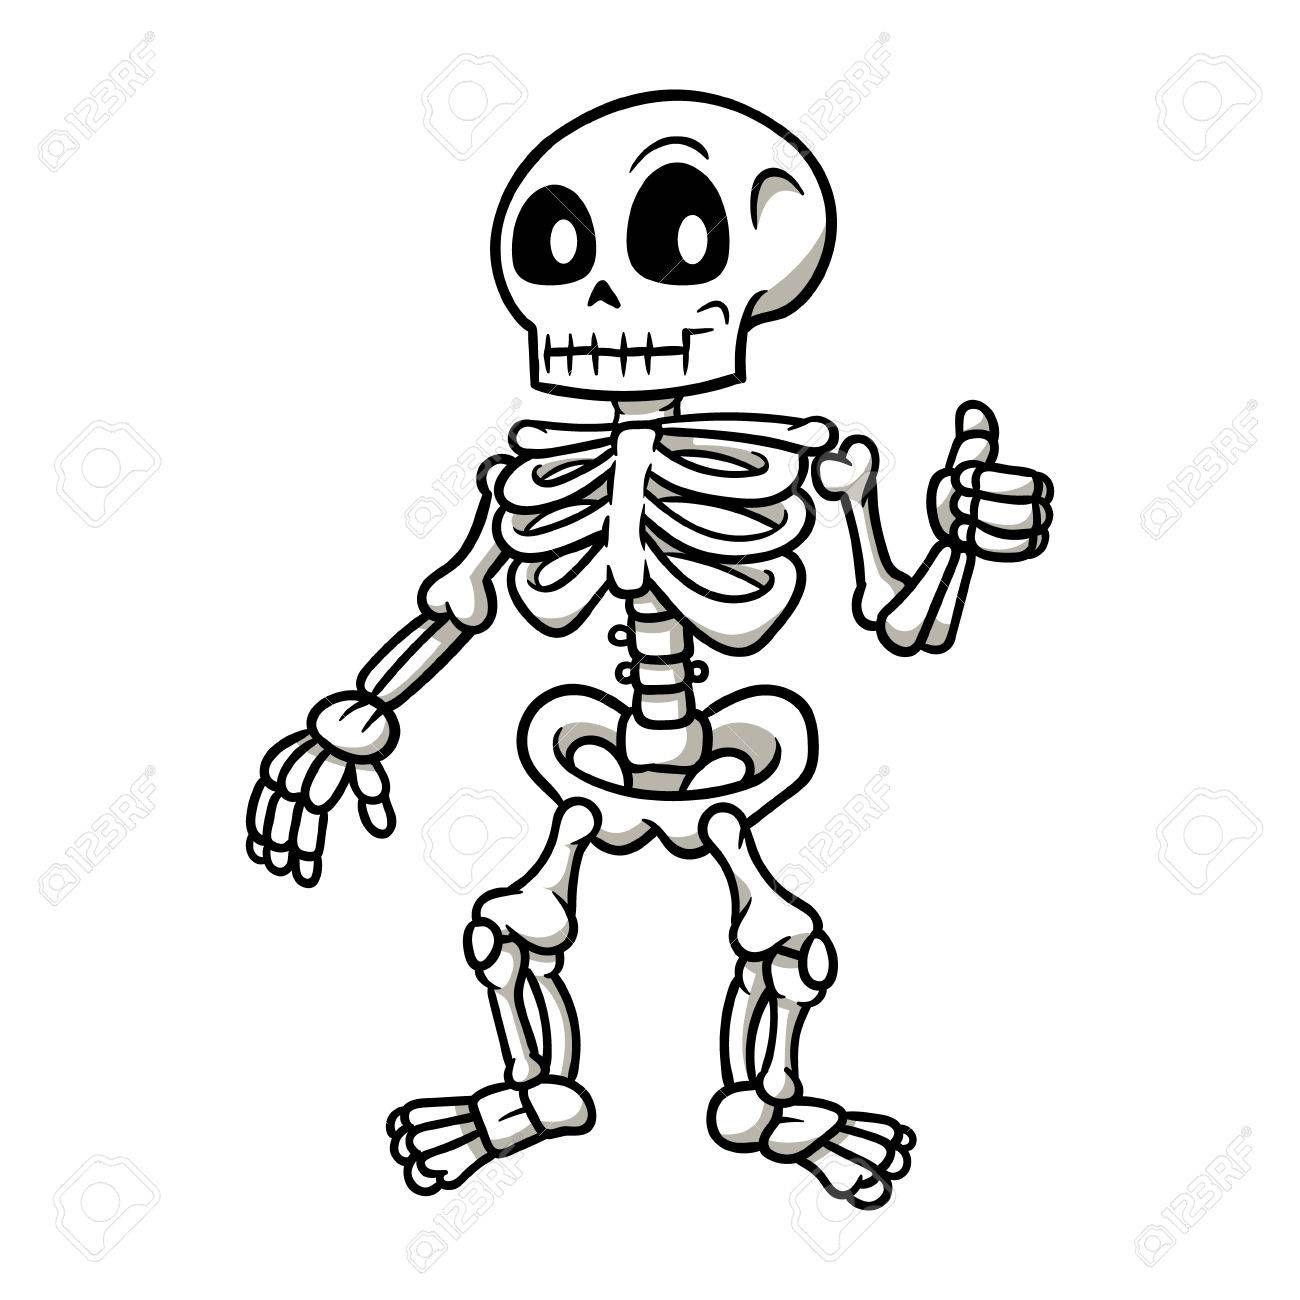 Cartoon Skeleton Giving A Thumbs Up Vector Illustration Em